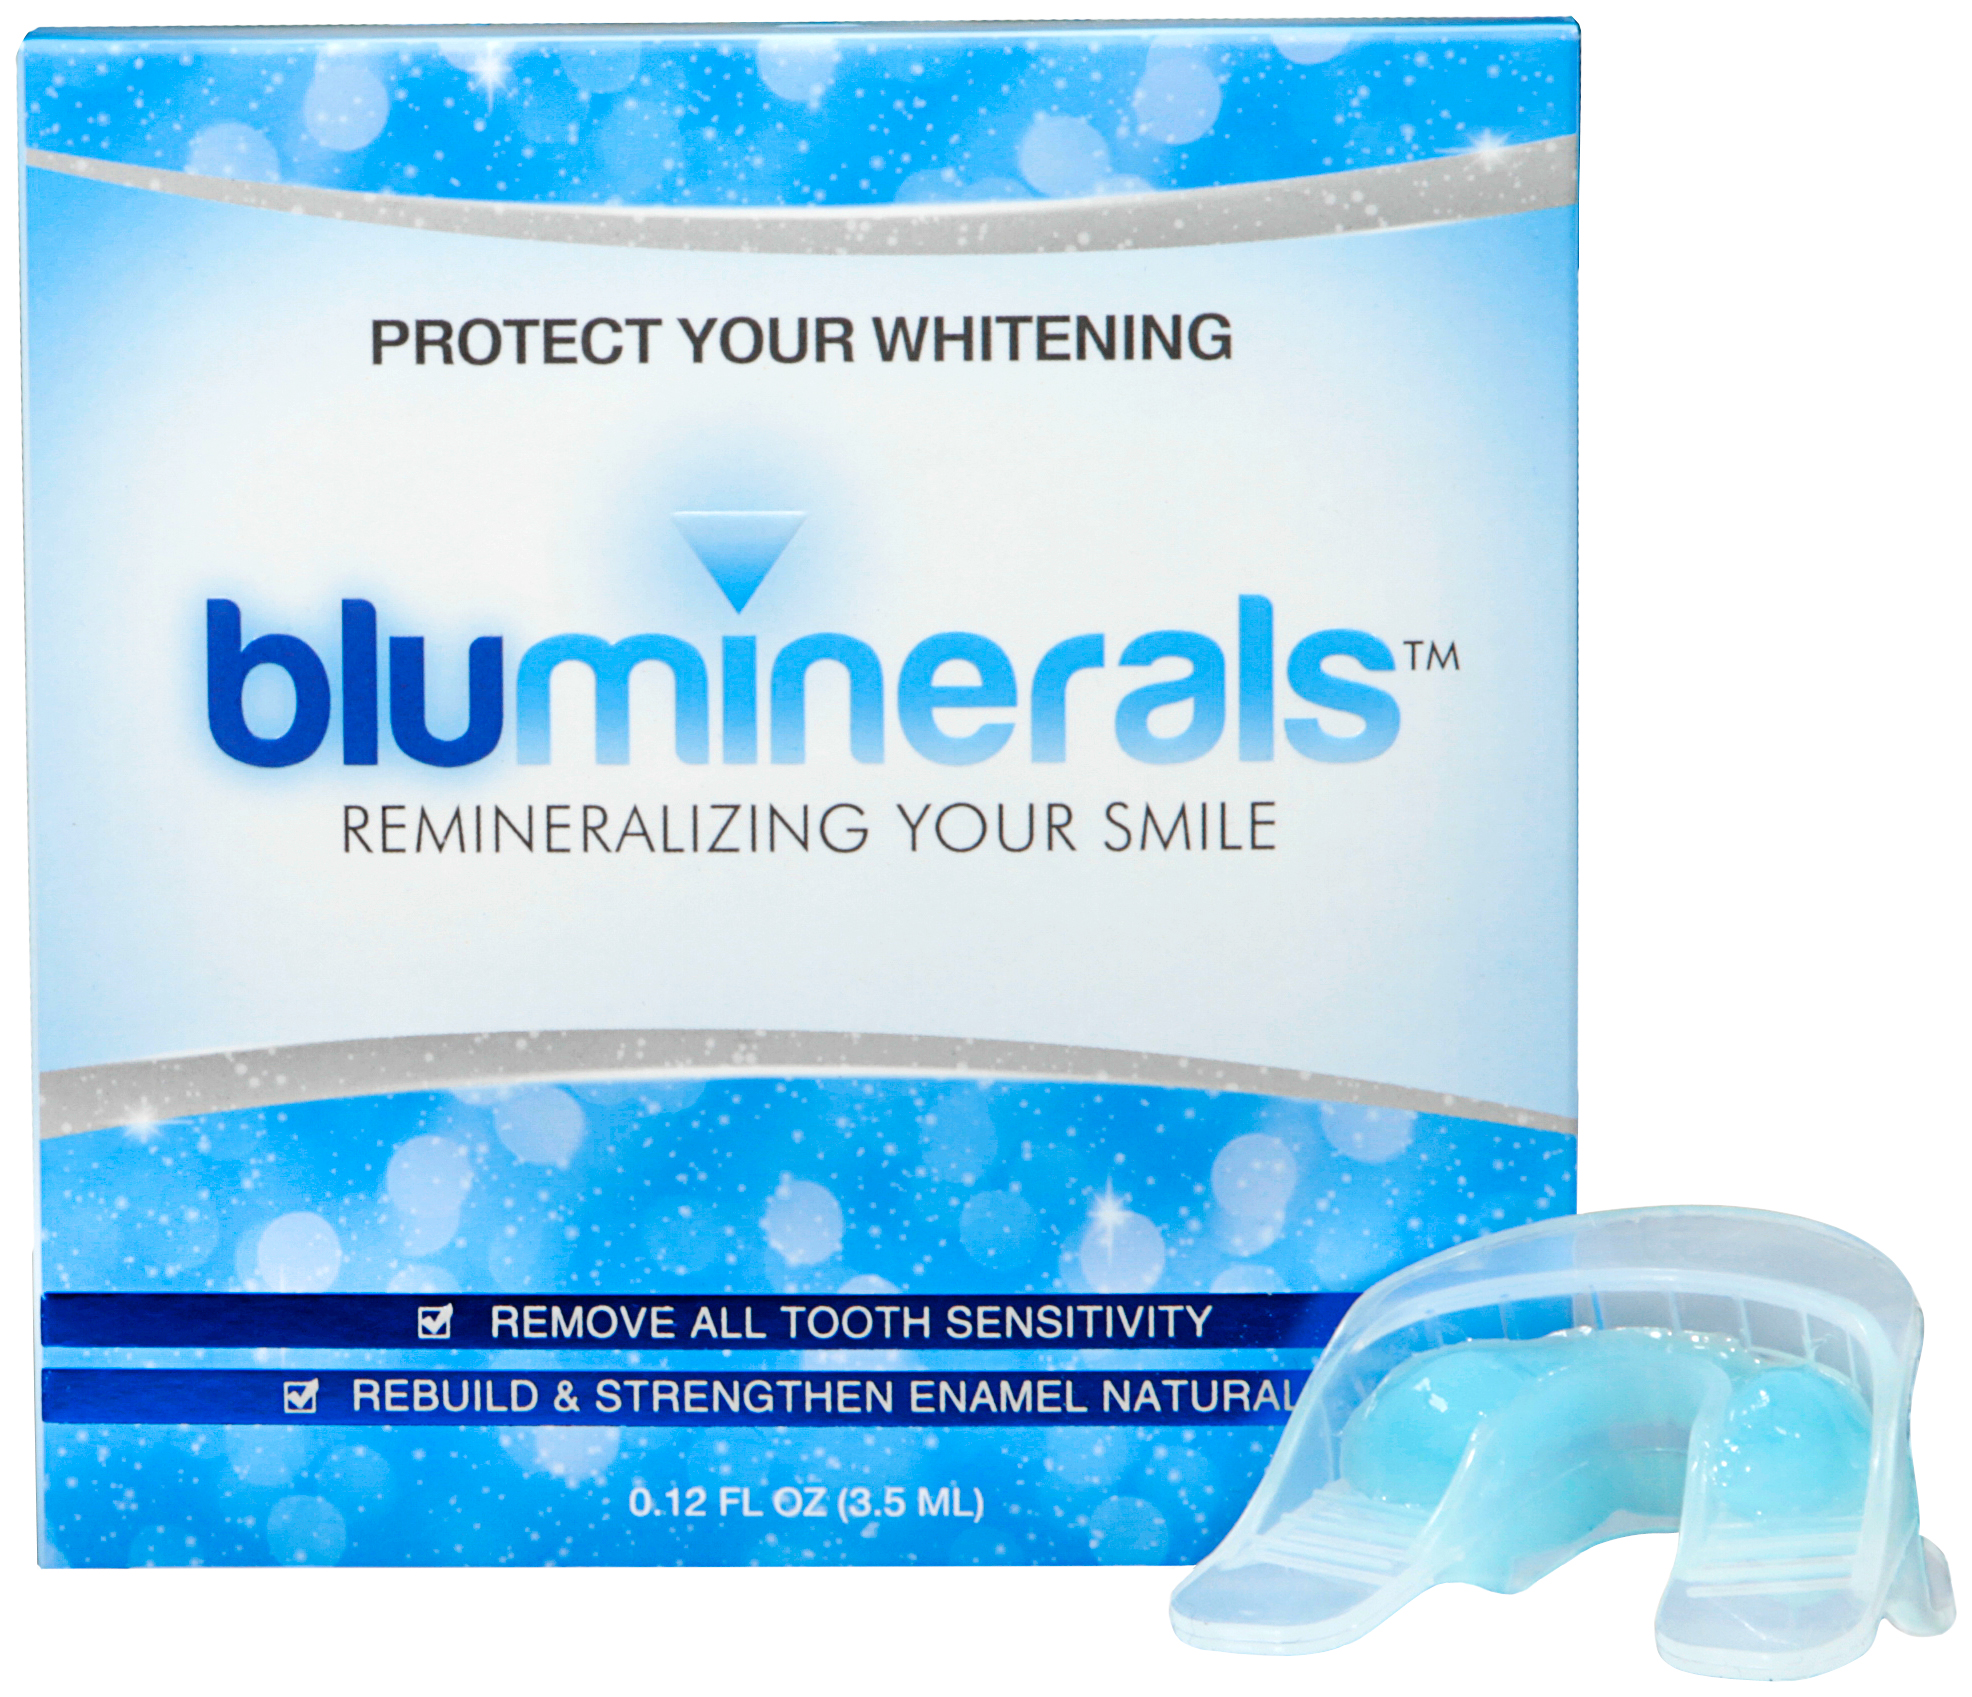 bluminerals-mouth-piece.jpg